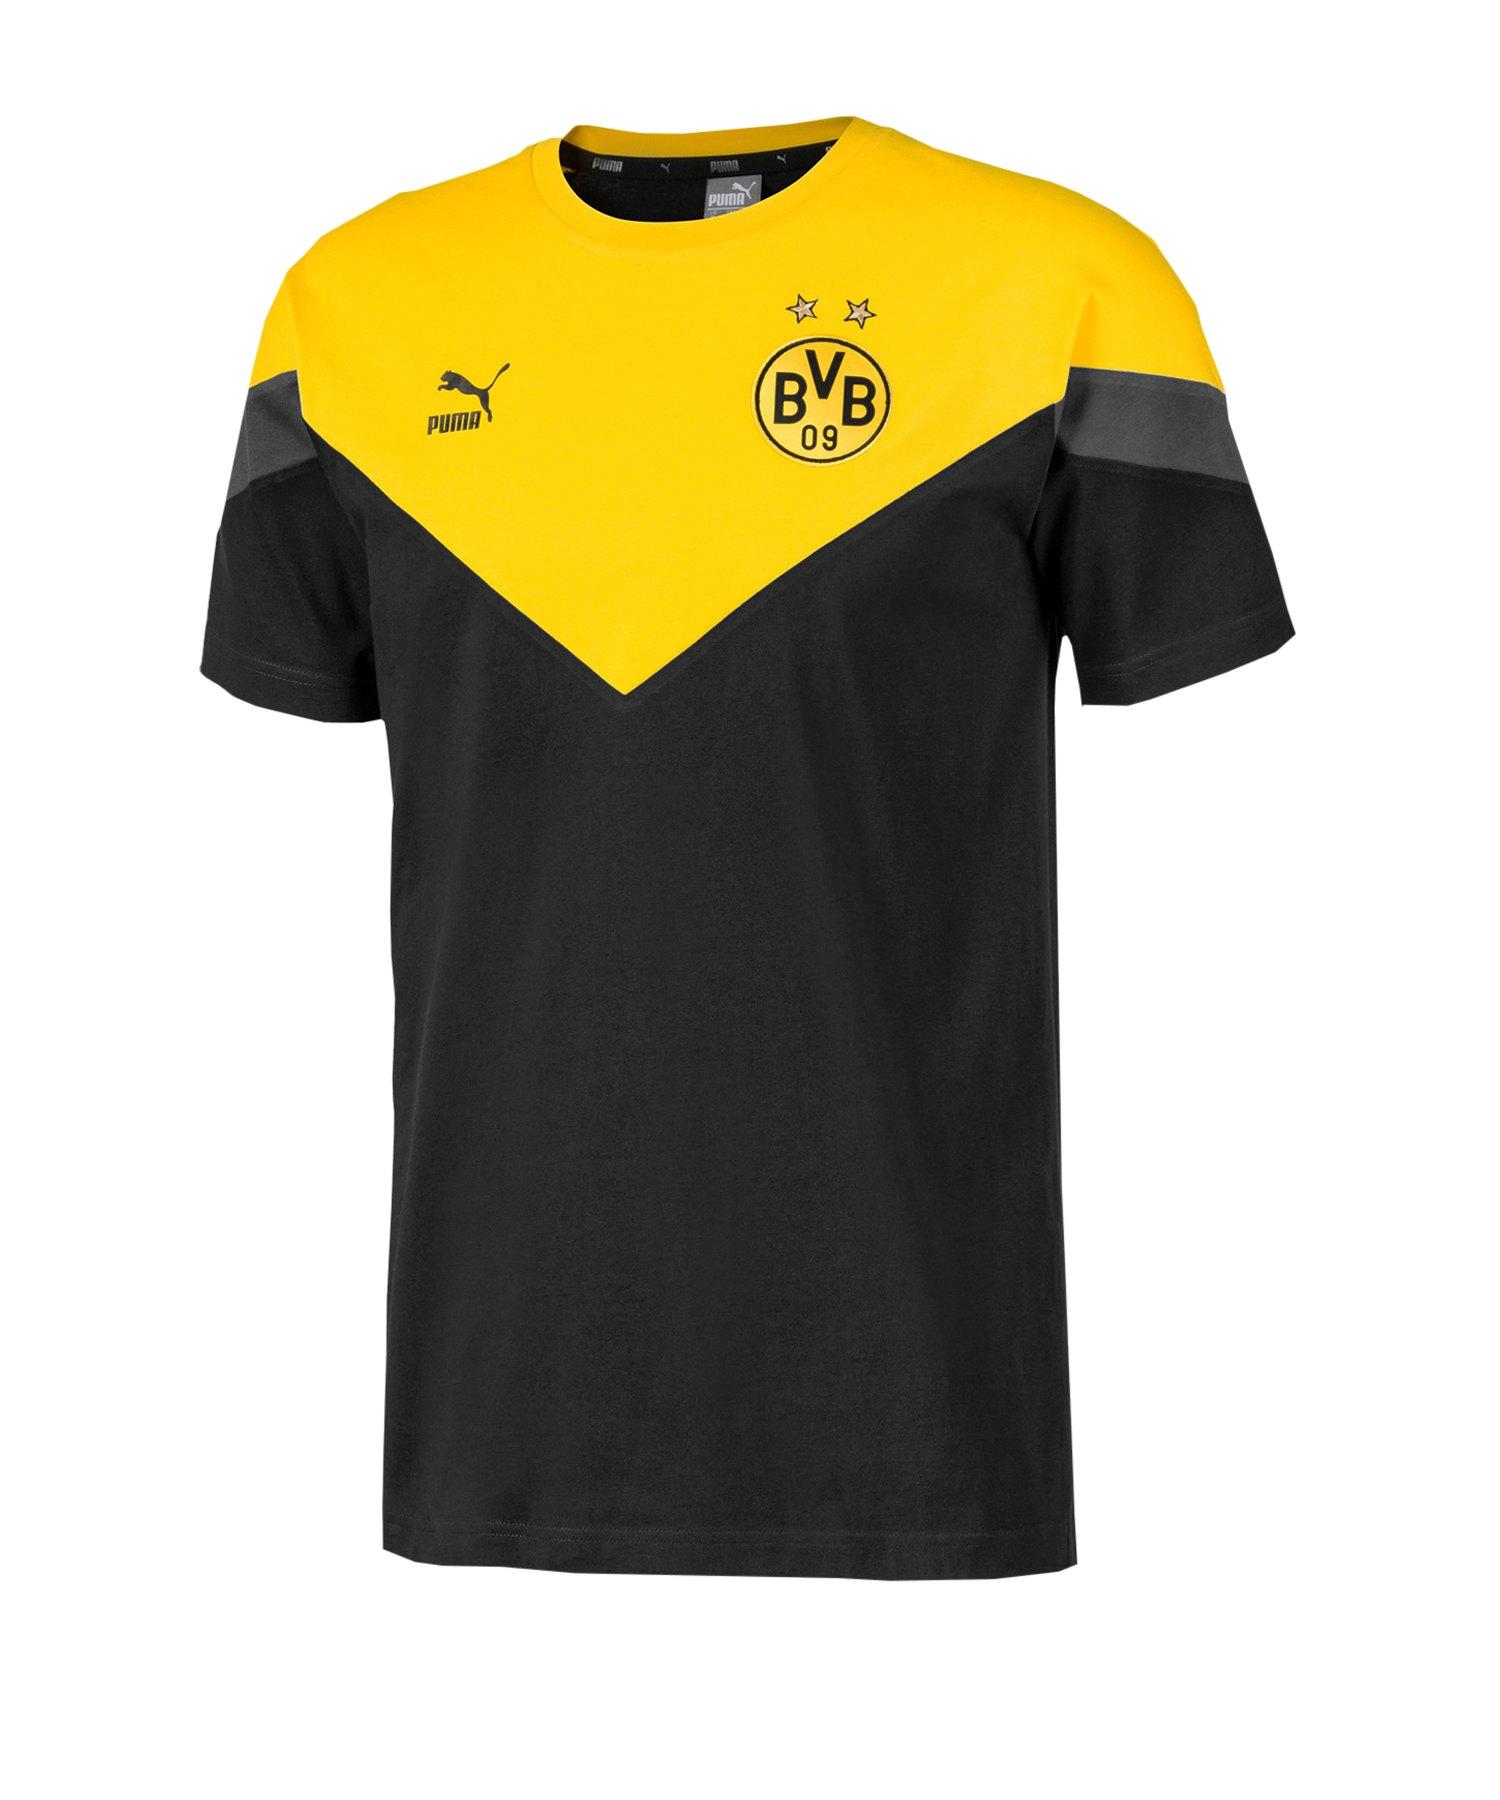 PUMA BVB Dortmund Iconic MCS Tee T-Shirt F01 - schwarz